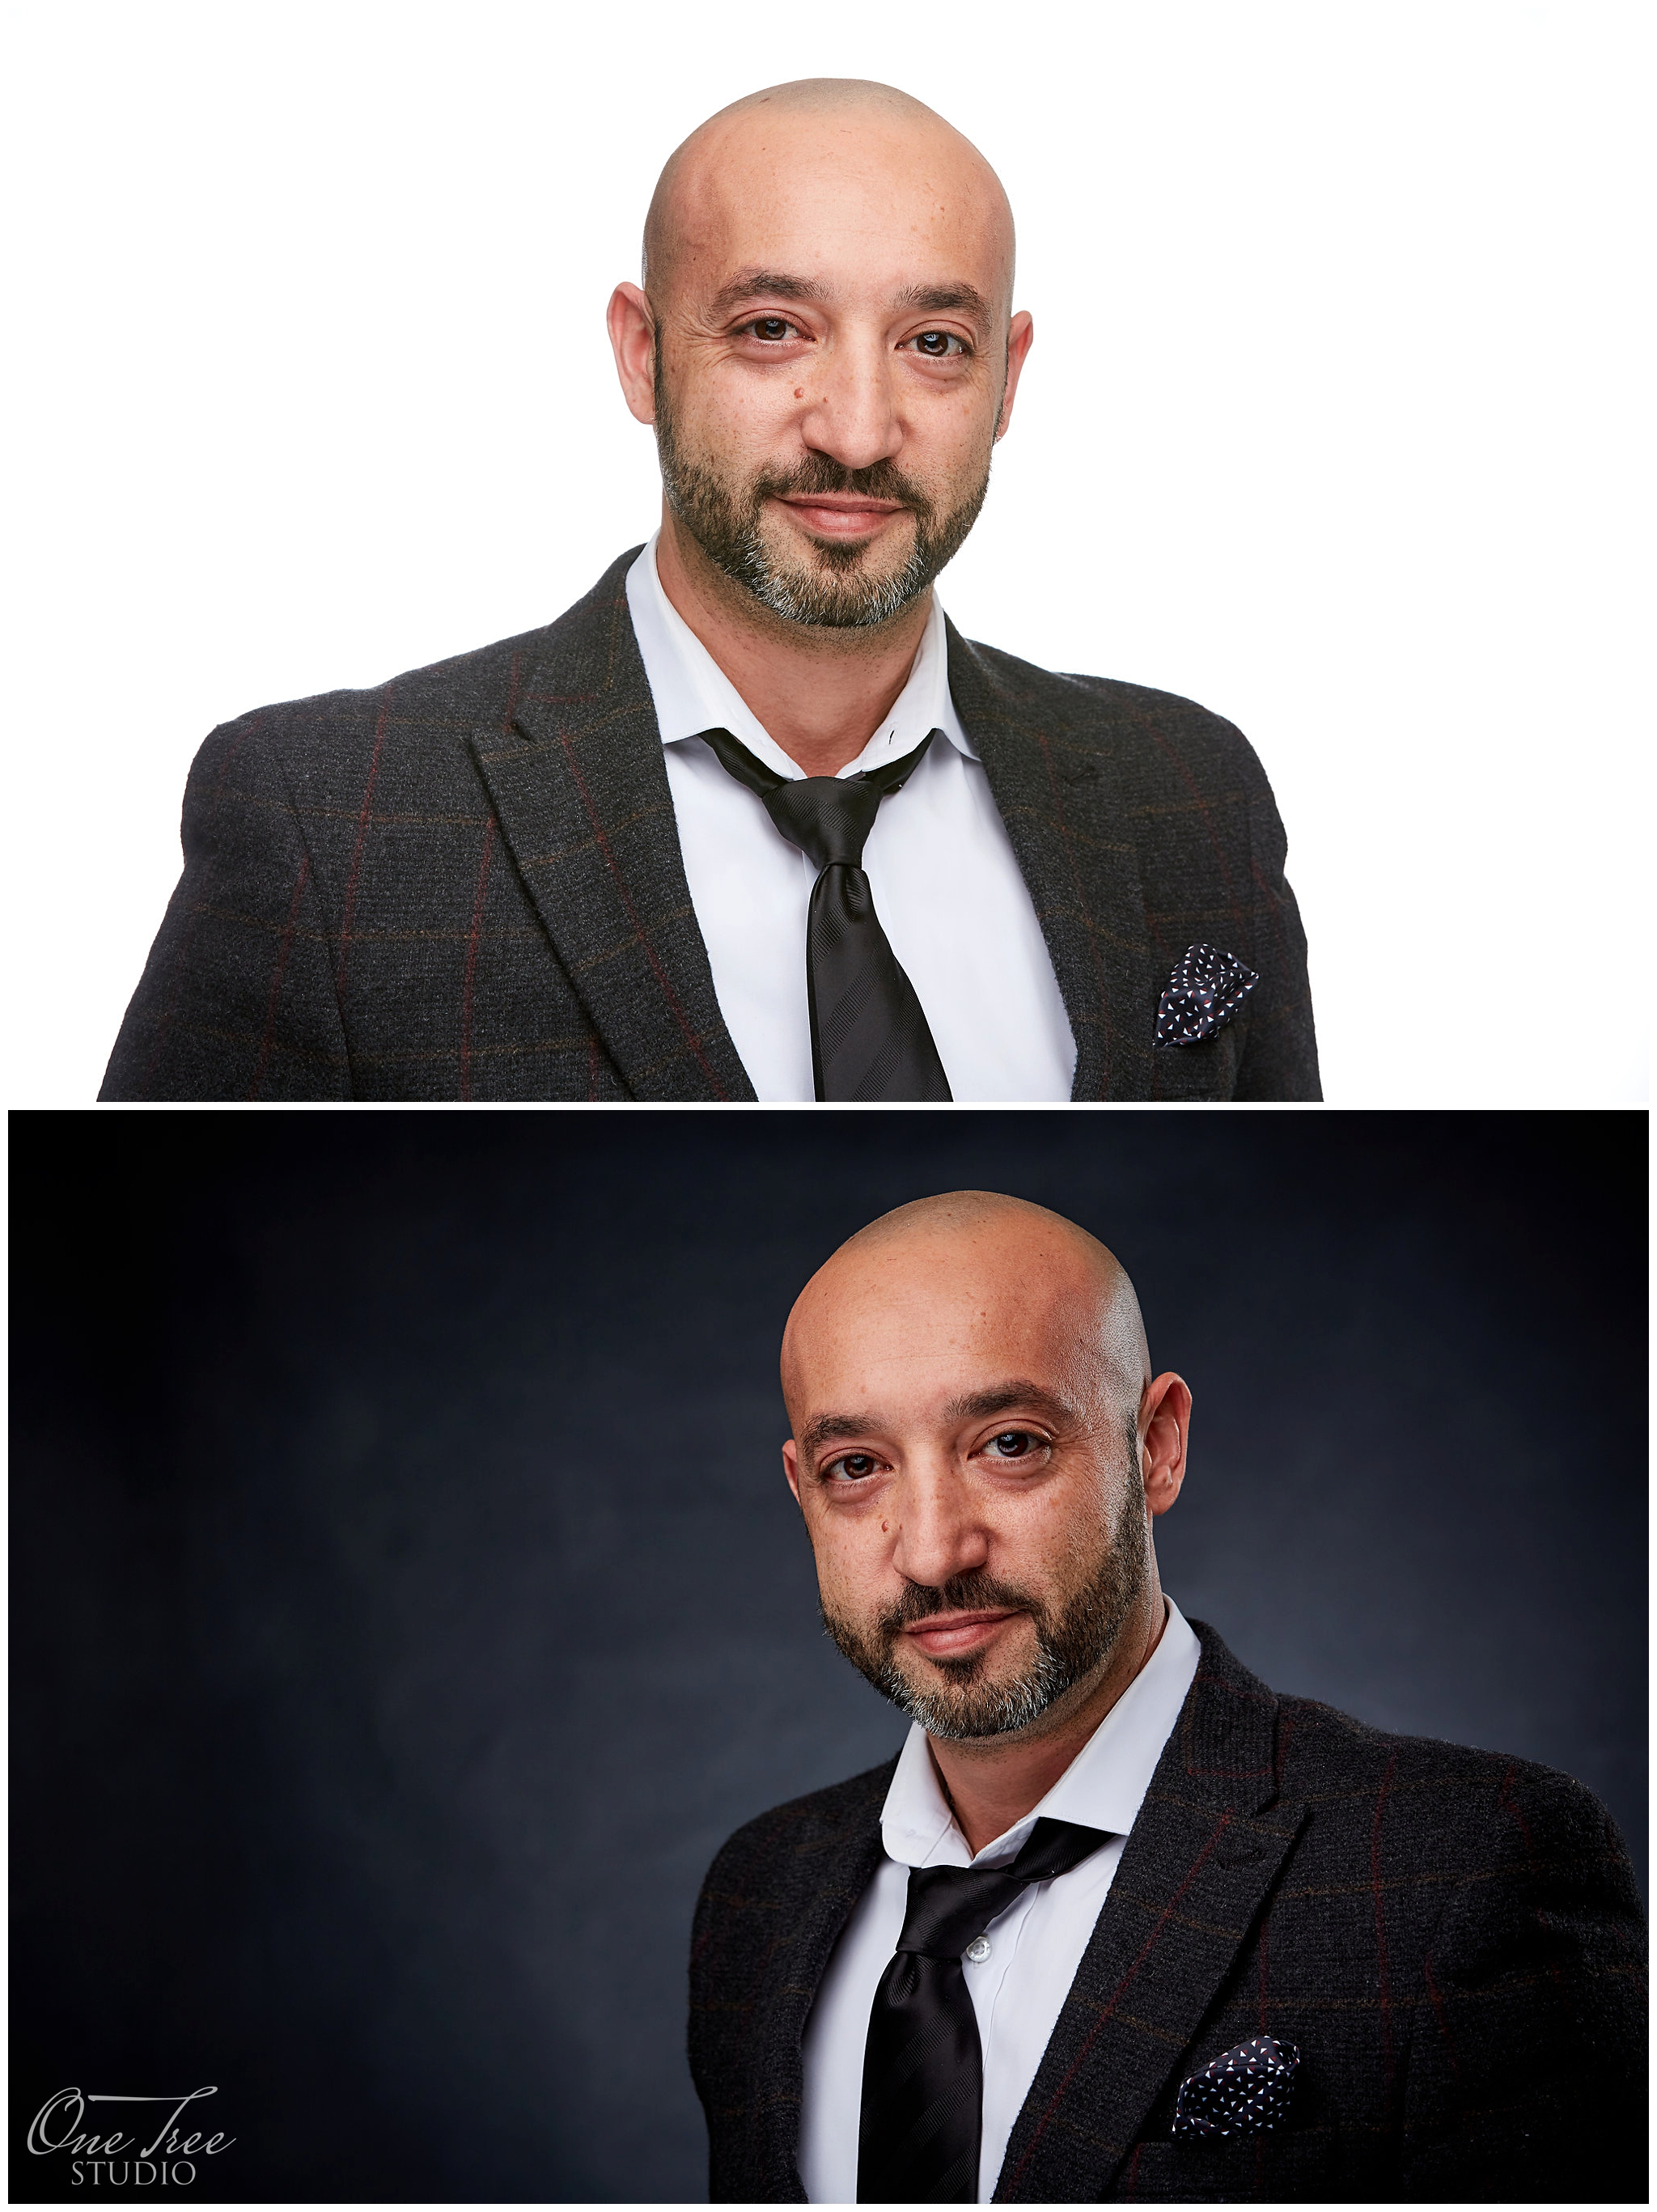 Pro Headshot Booth | Toronto Headshot Photographer | One Tree Studio Inc.